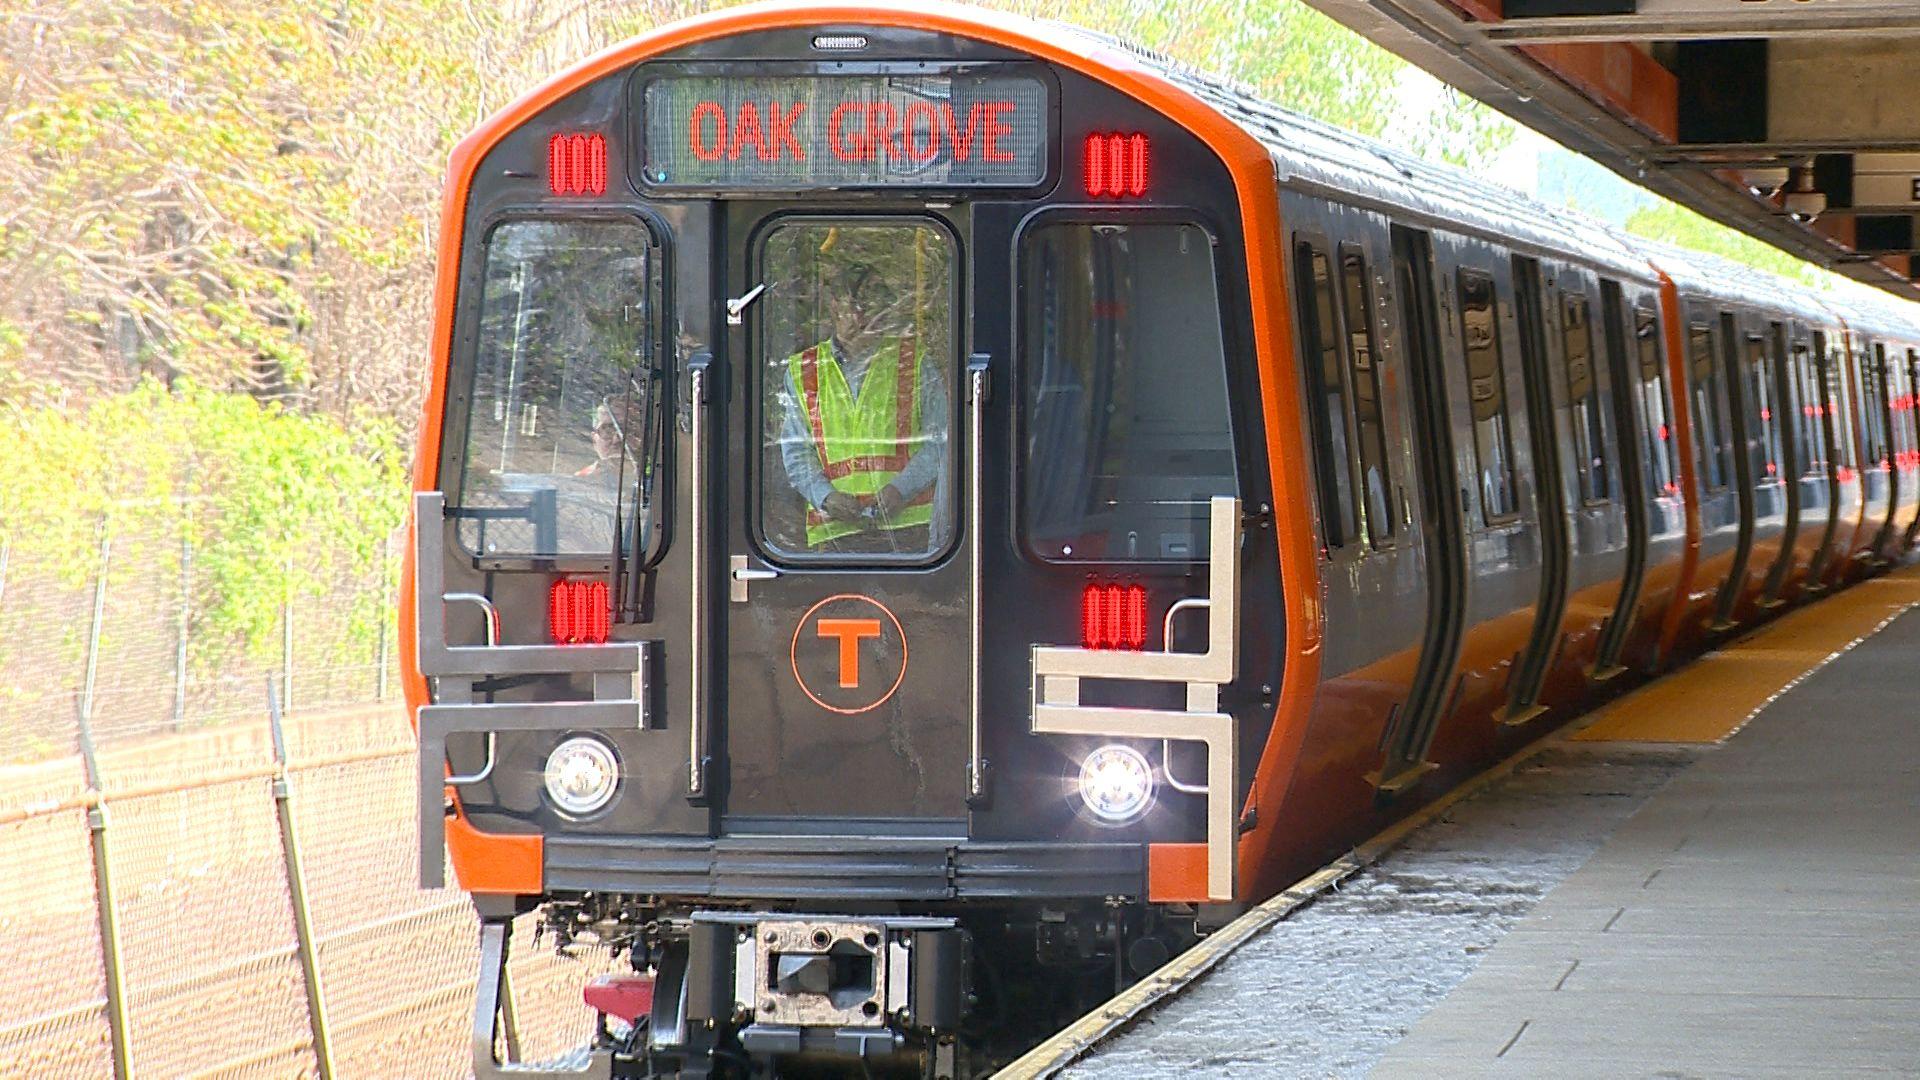 Ride bostons orange line mbta subway train of the future sciox Gallery